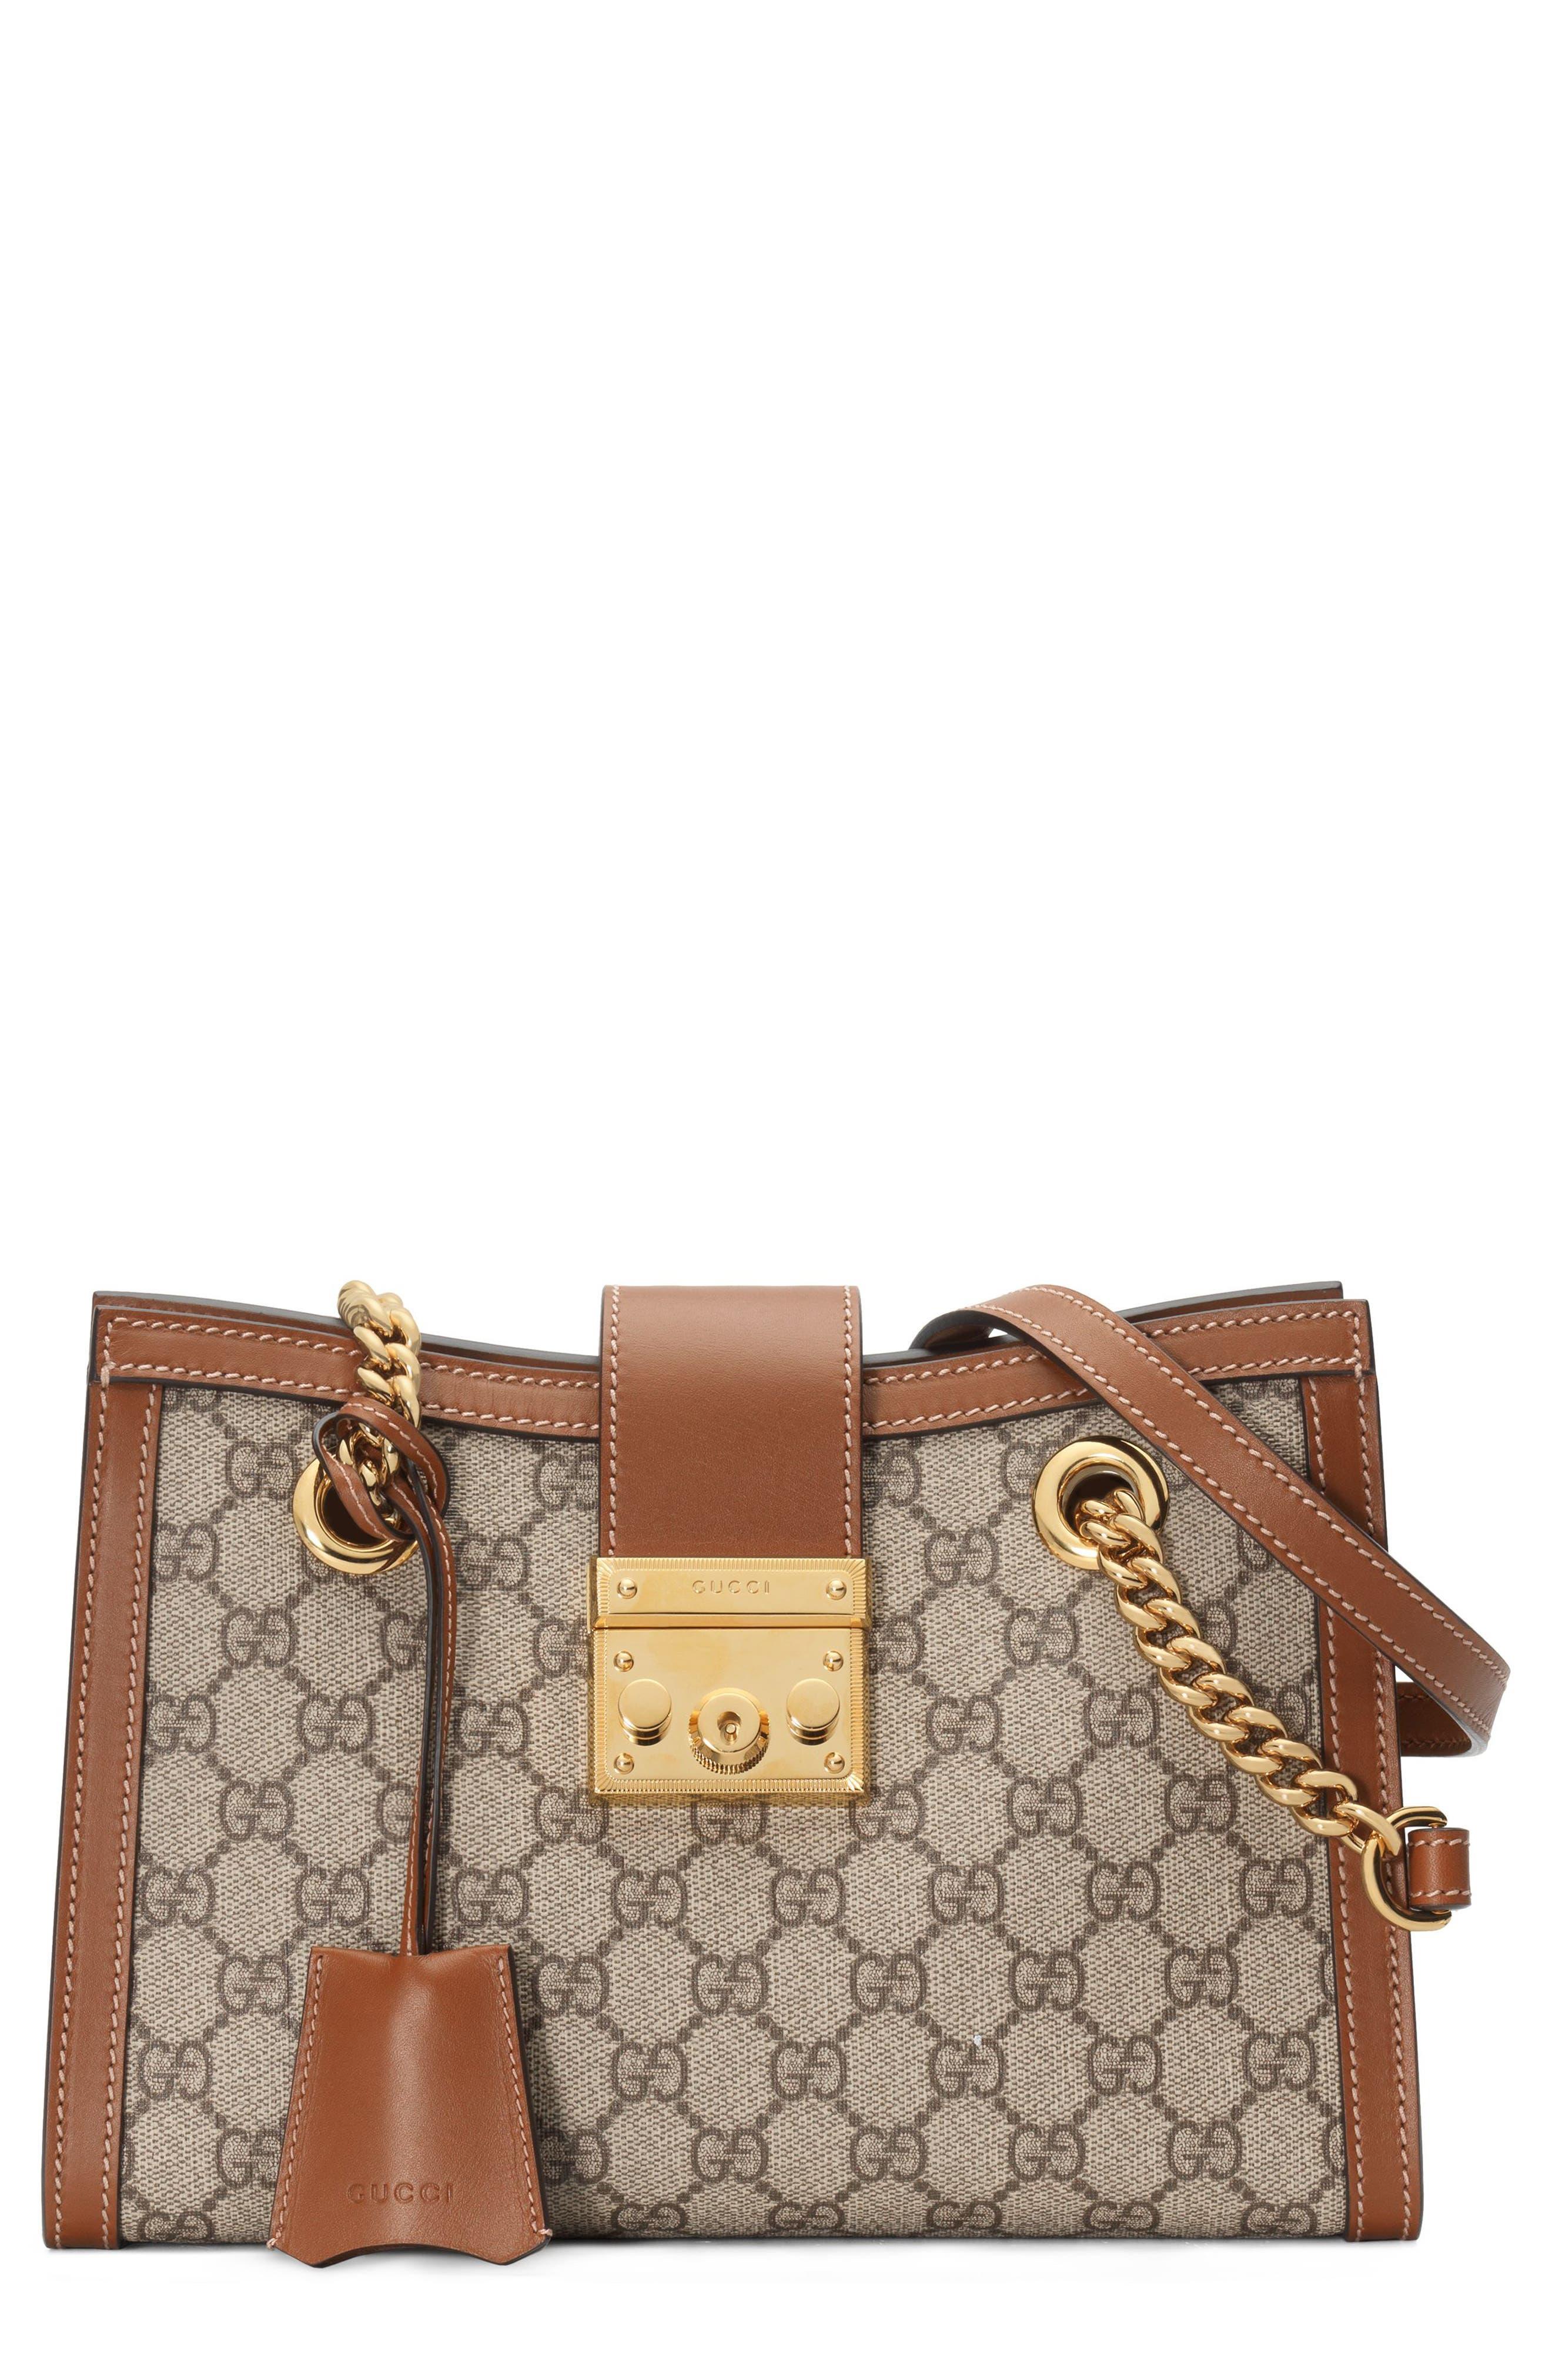 Small Padlock GG Supreme Shoulder Bag,                             Main thumbnail 1, color,                             BEIGE EBONY/ TUSCANY